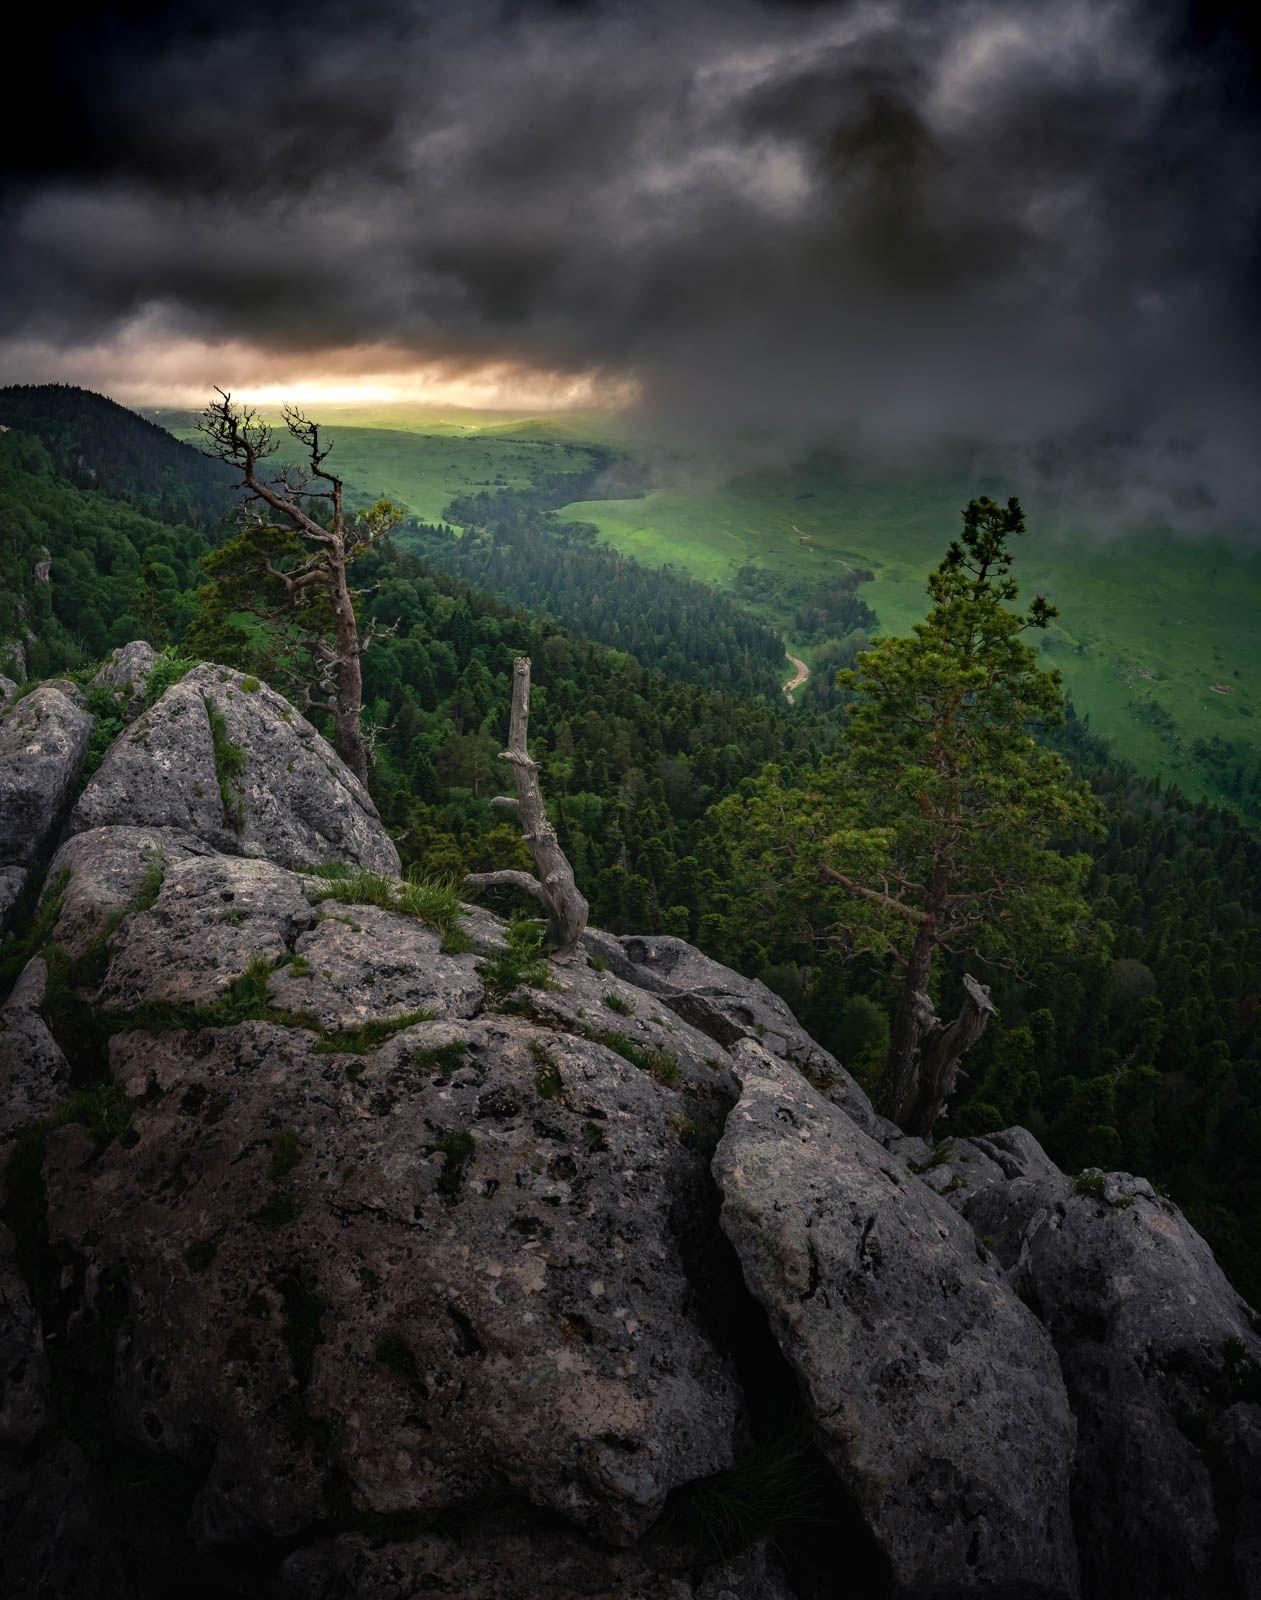 Заоблачное Лаго-Наки кавказ лаго-наки гроза облака скалы камни деревья лес природа шторм